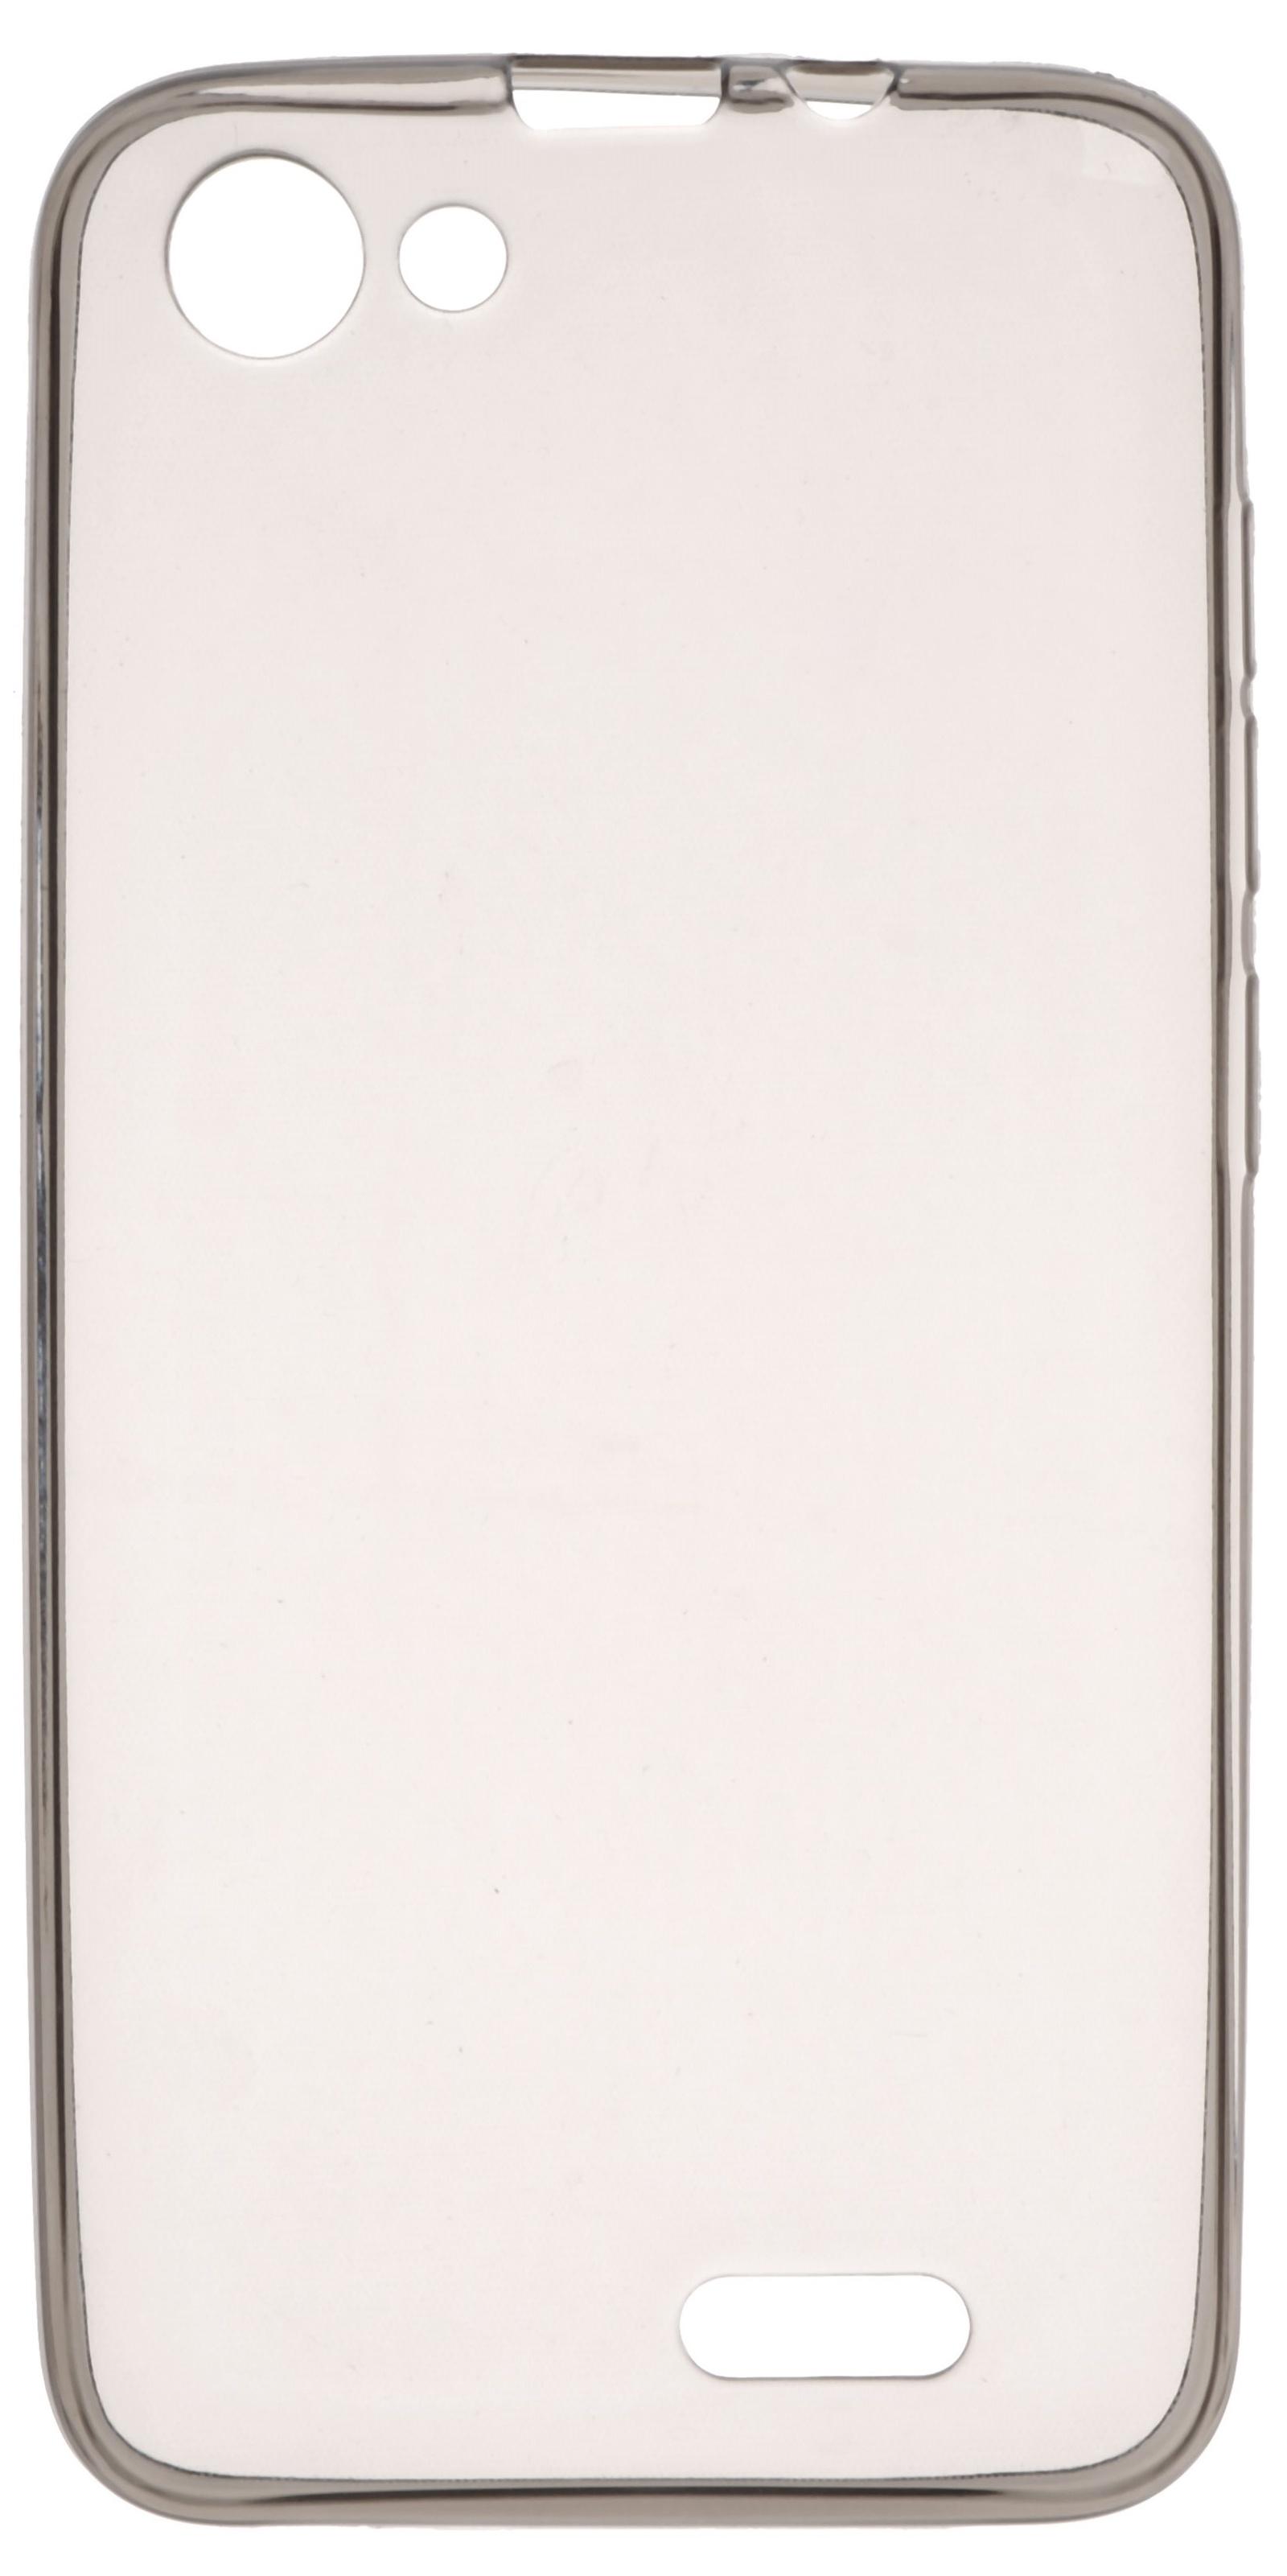 Чехол для сотового телефона skinBOX Slim Silicone, 4630042521605, серый цена и фото